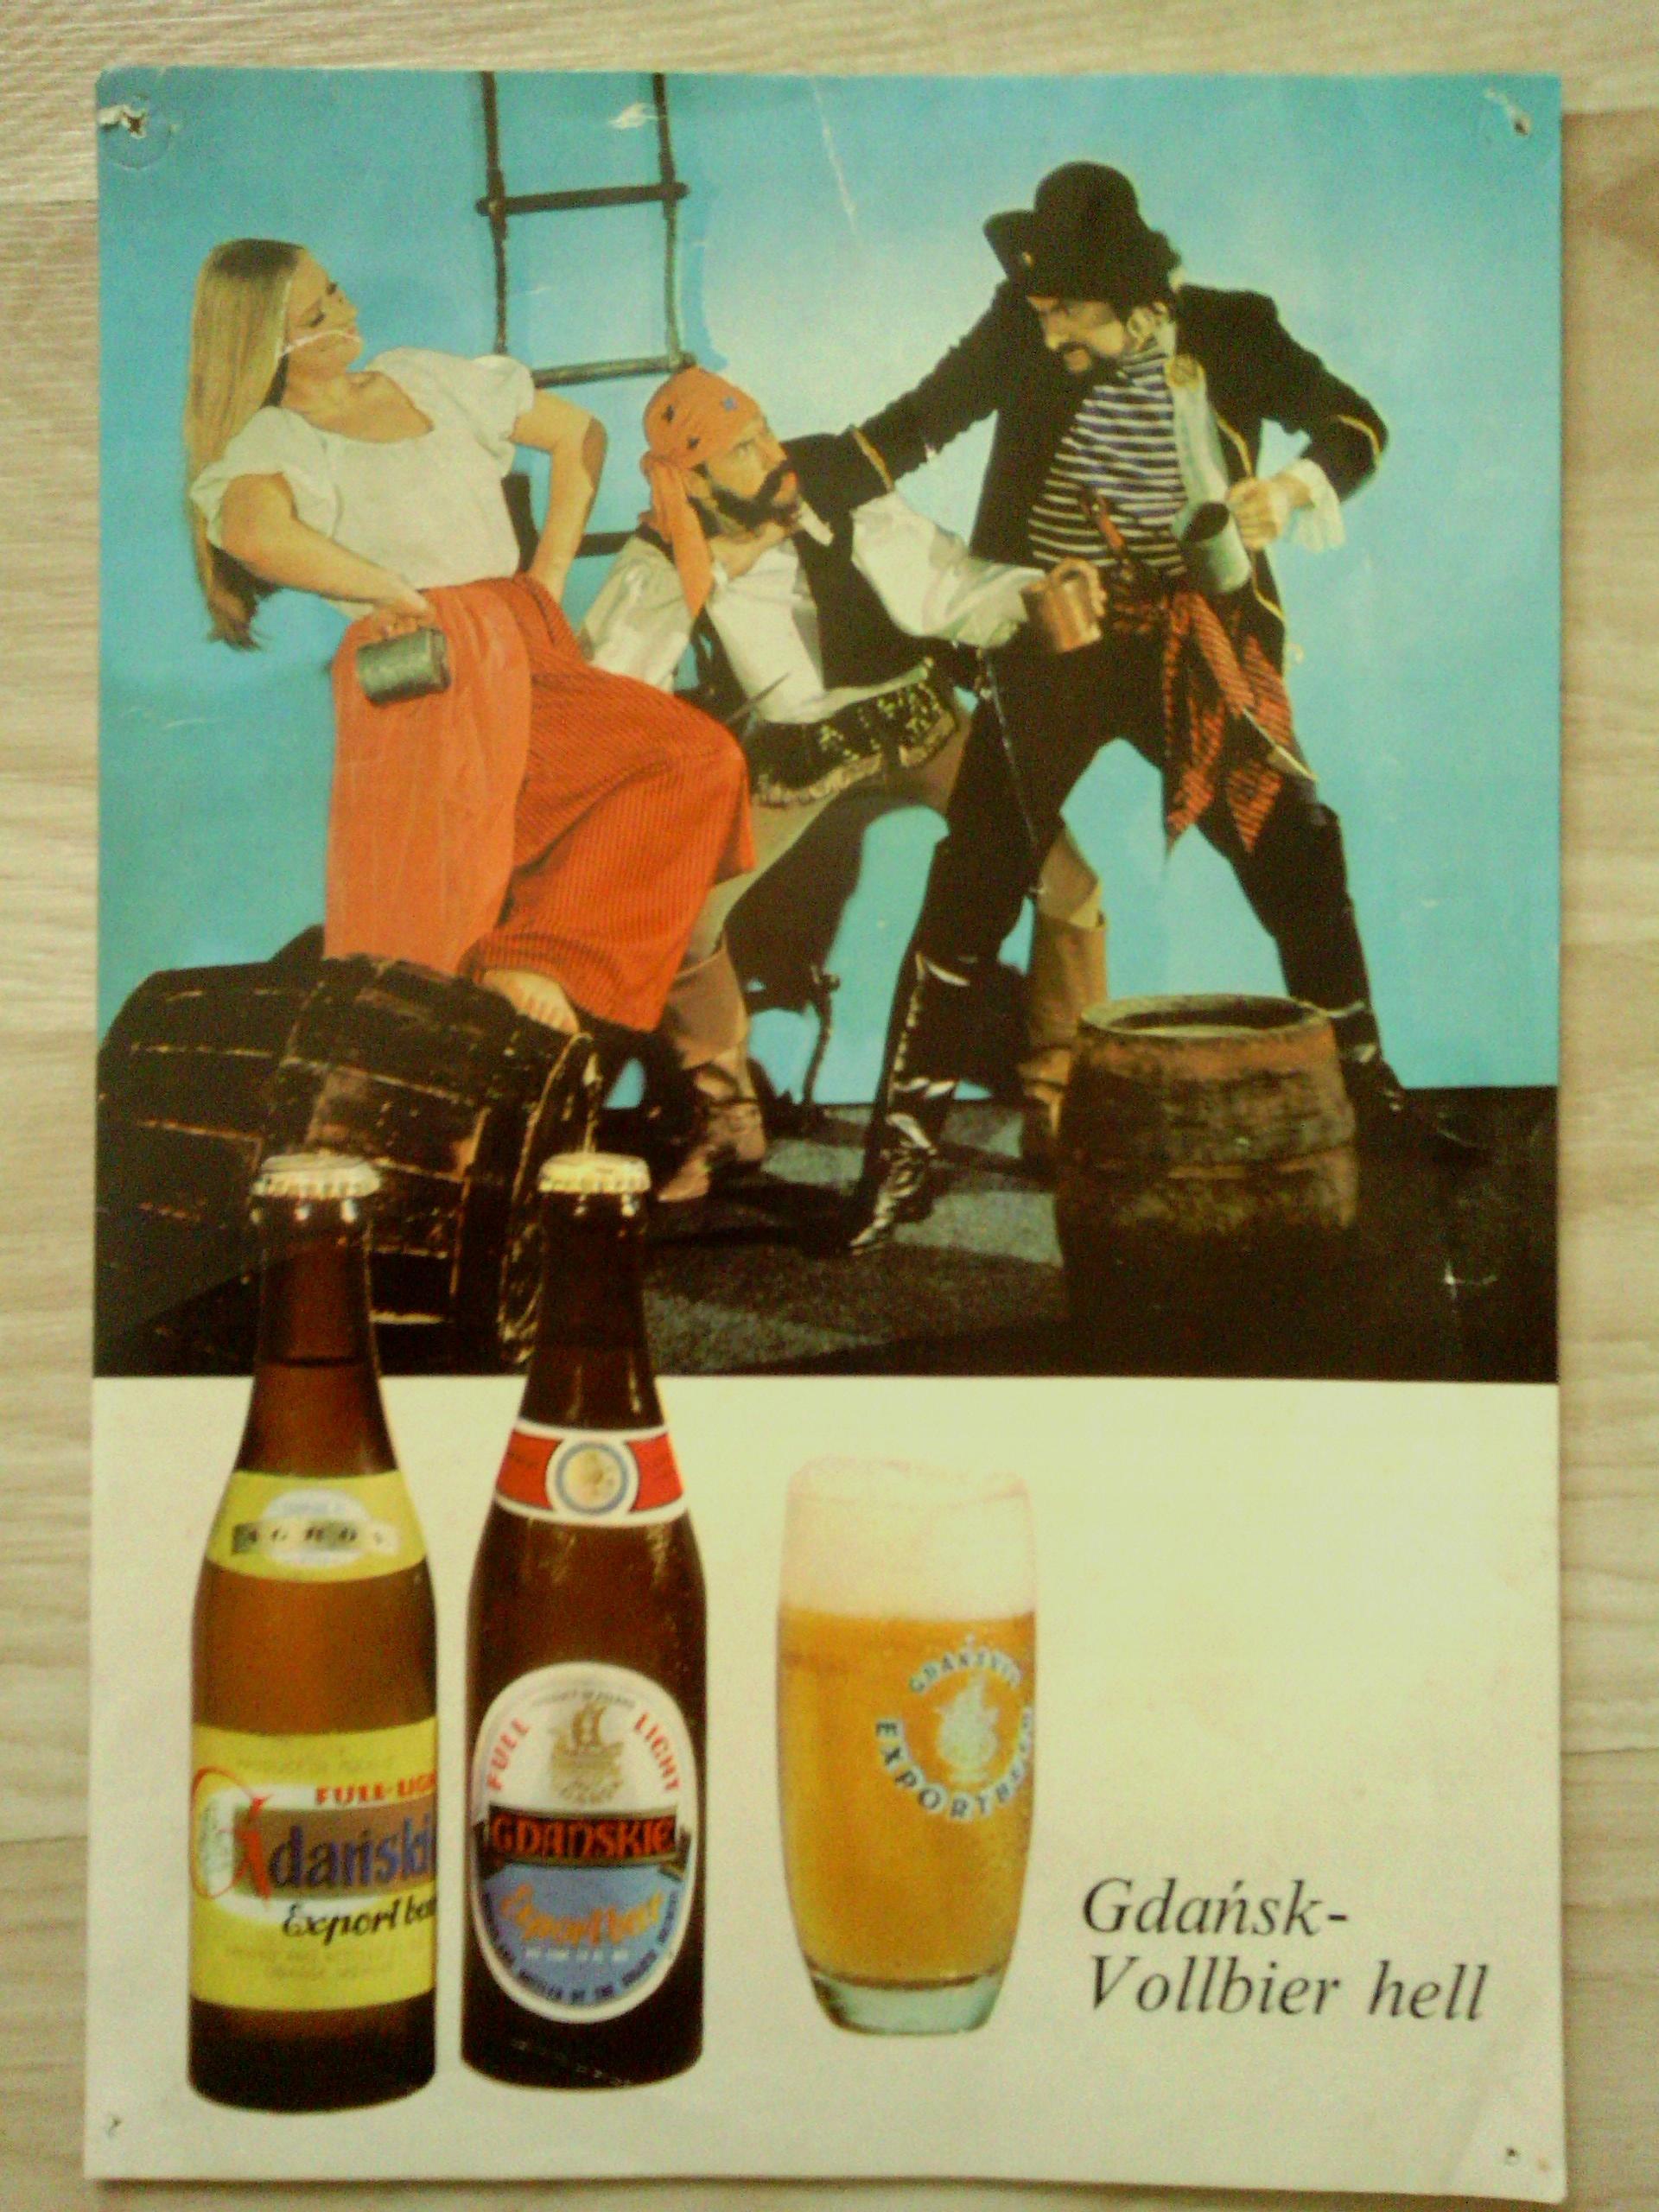 Stara Reklamaplakat Piwo Gdańskie